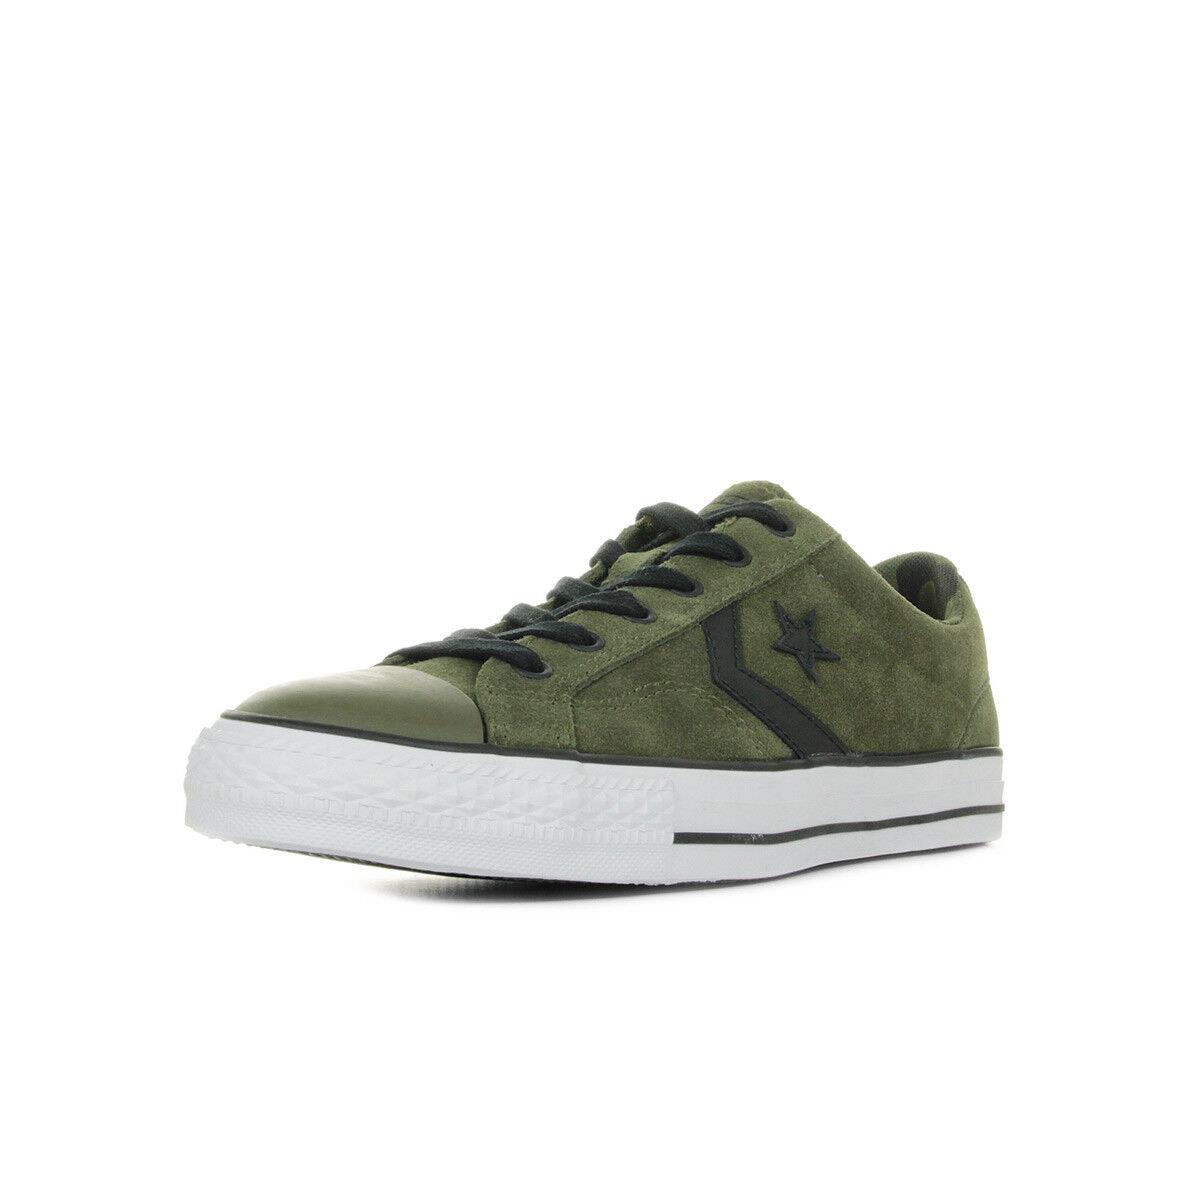 Schuhe Converse Herren Star Player OX grün